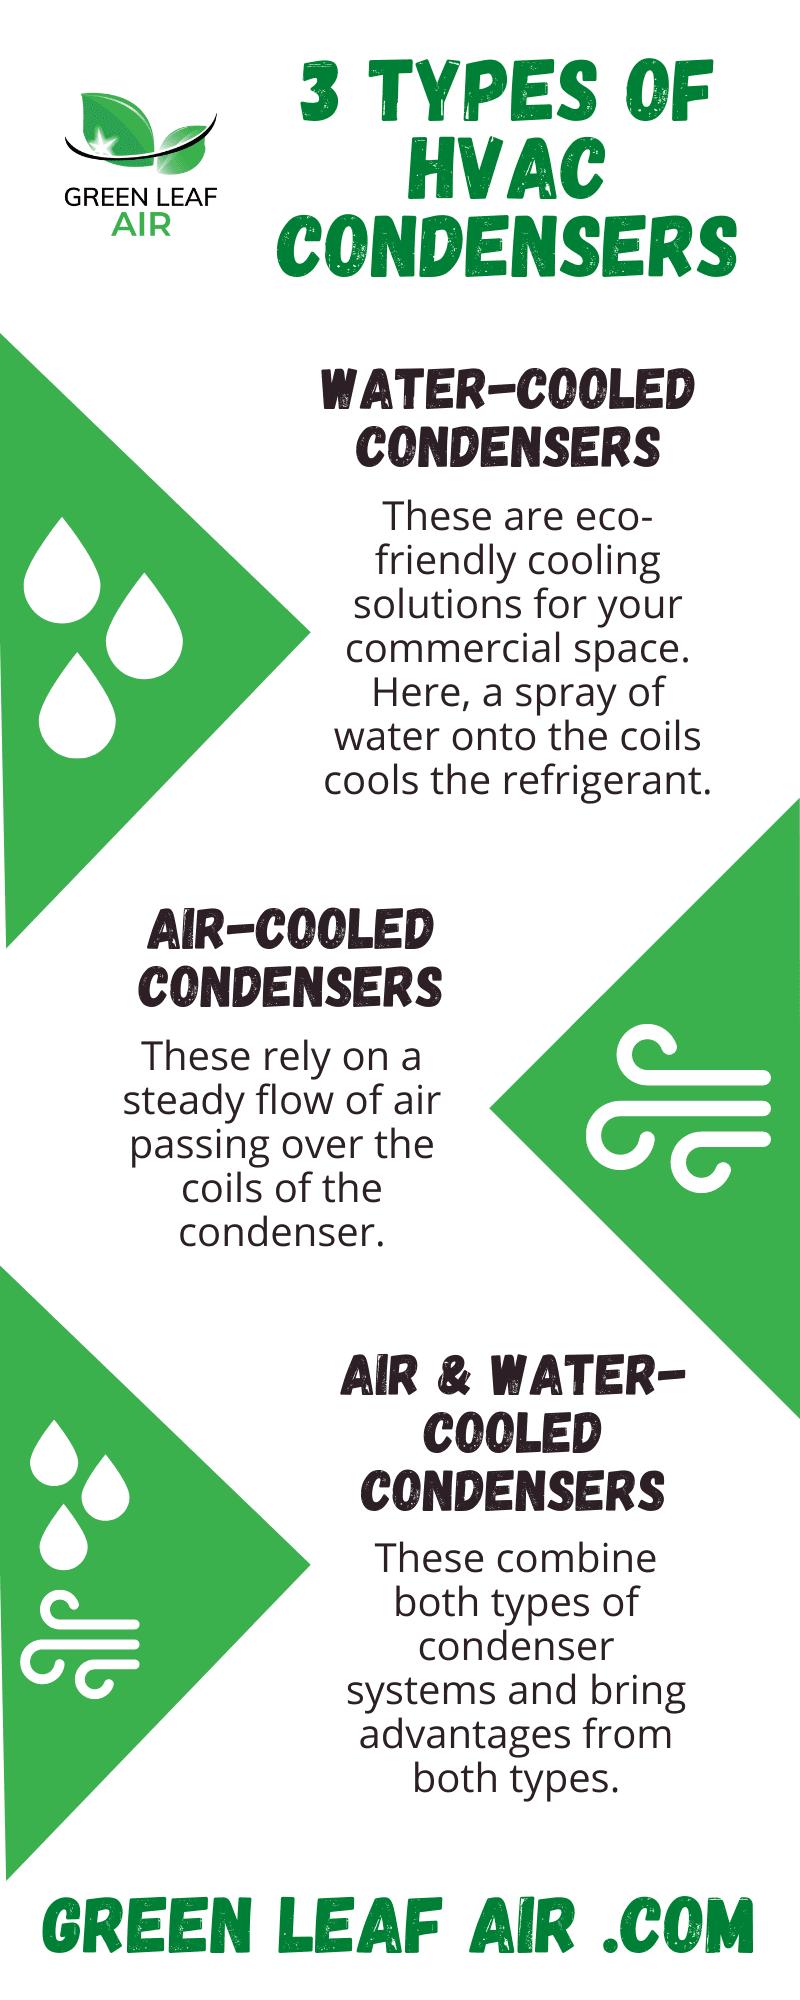 3 Types of HVAC Condensers